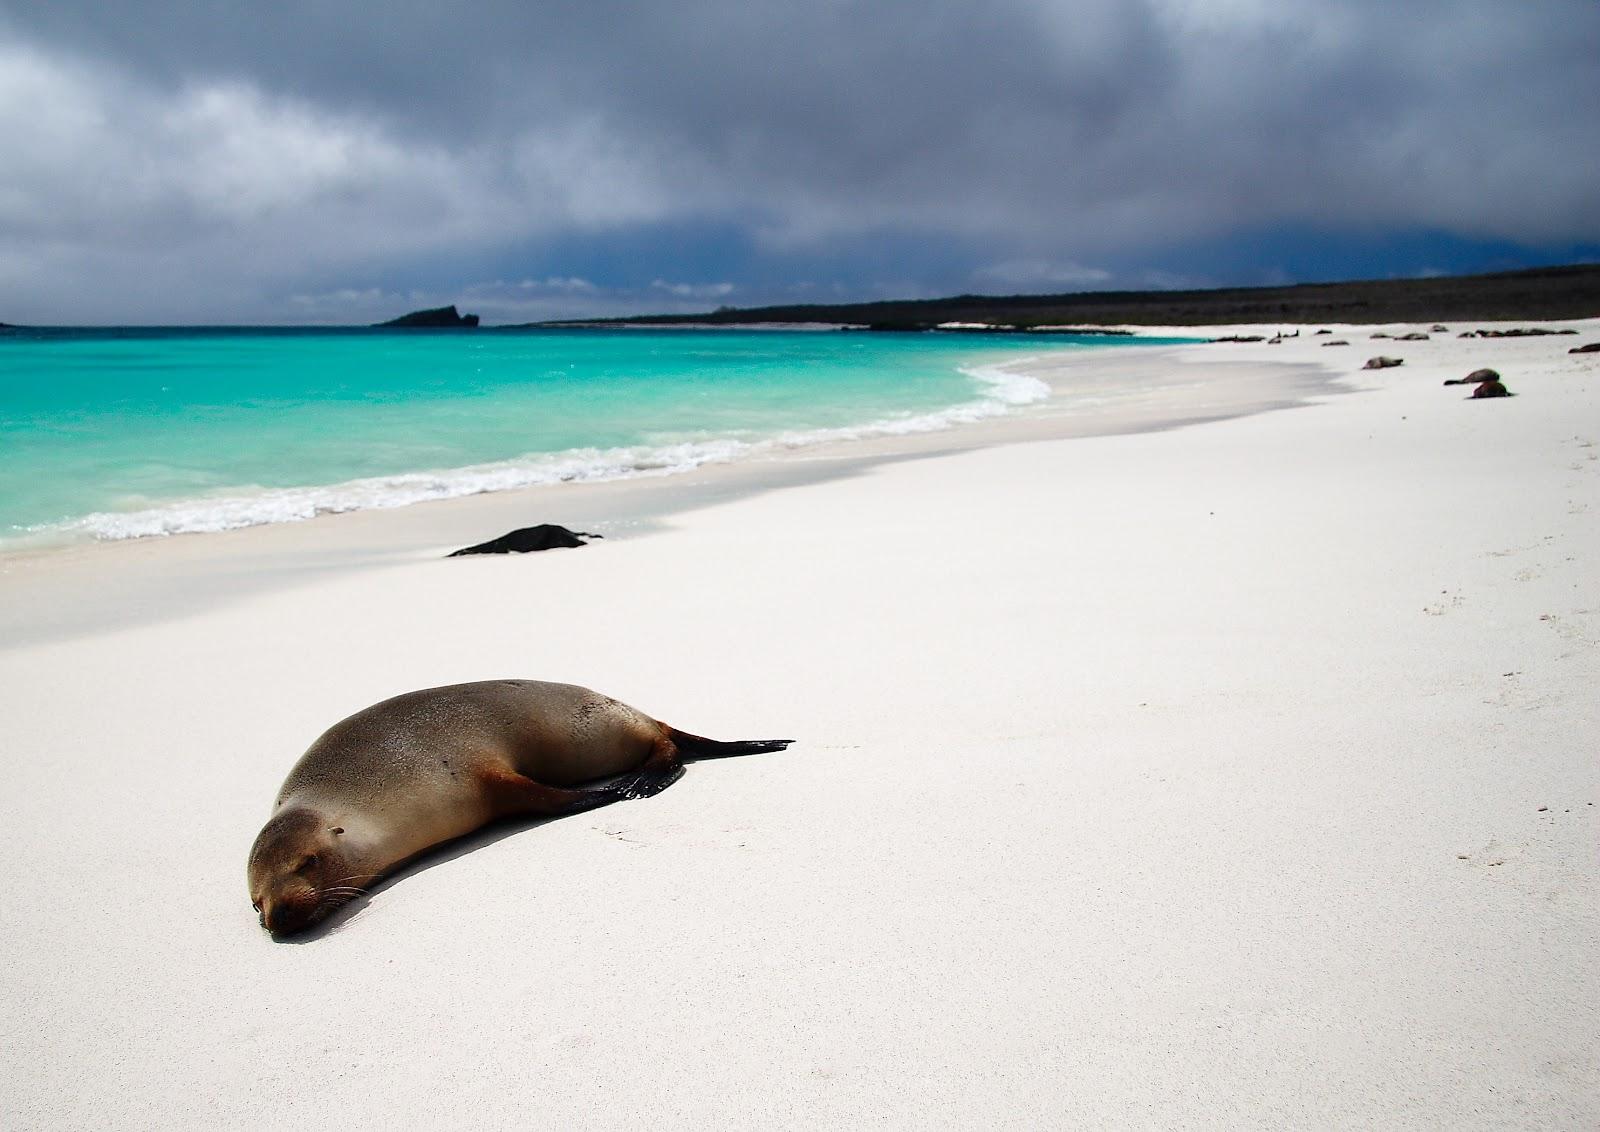 Gardner Bay on Espanola Island Galapagos sea lions on the white sand beach